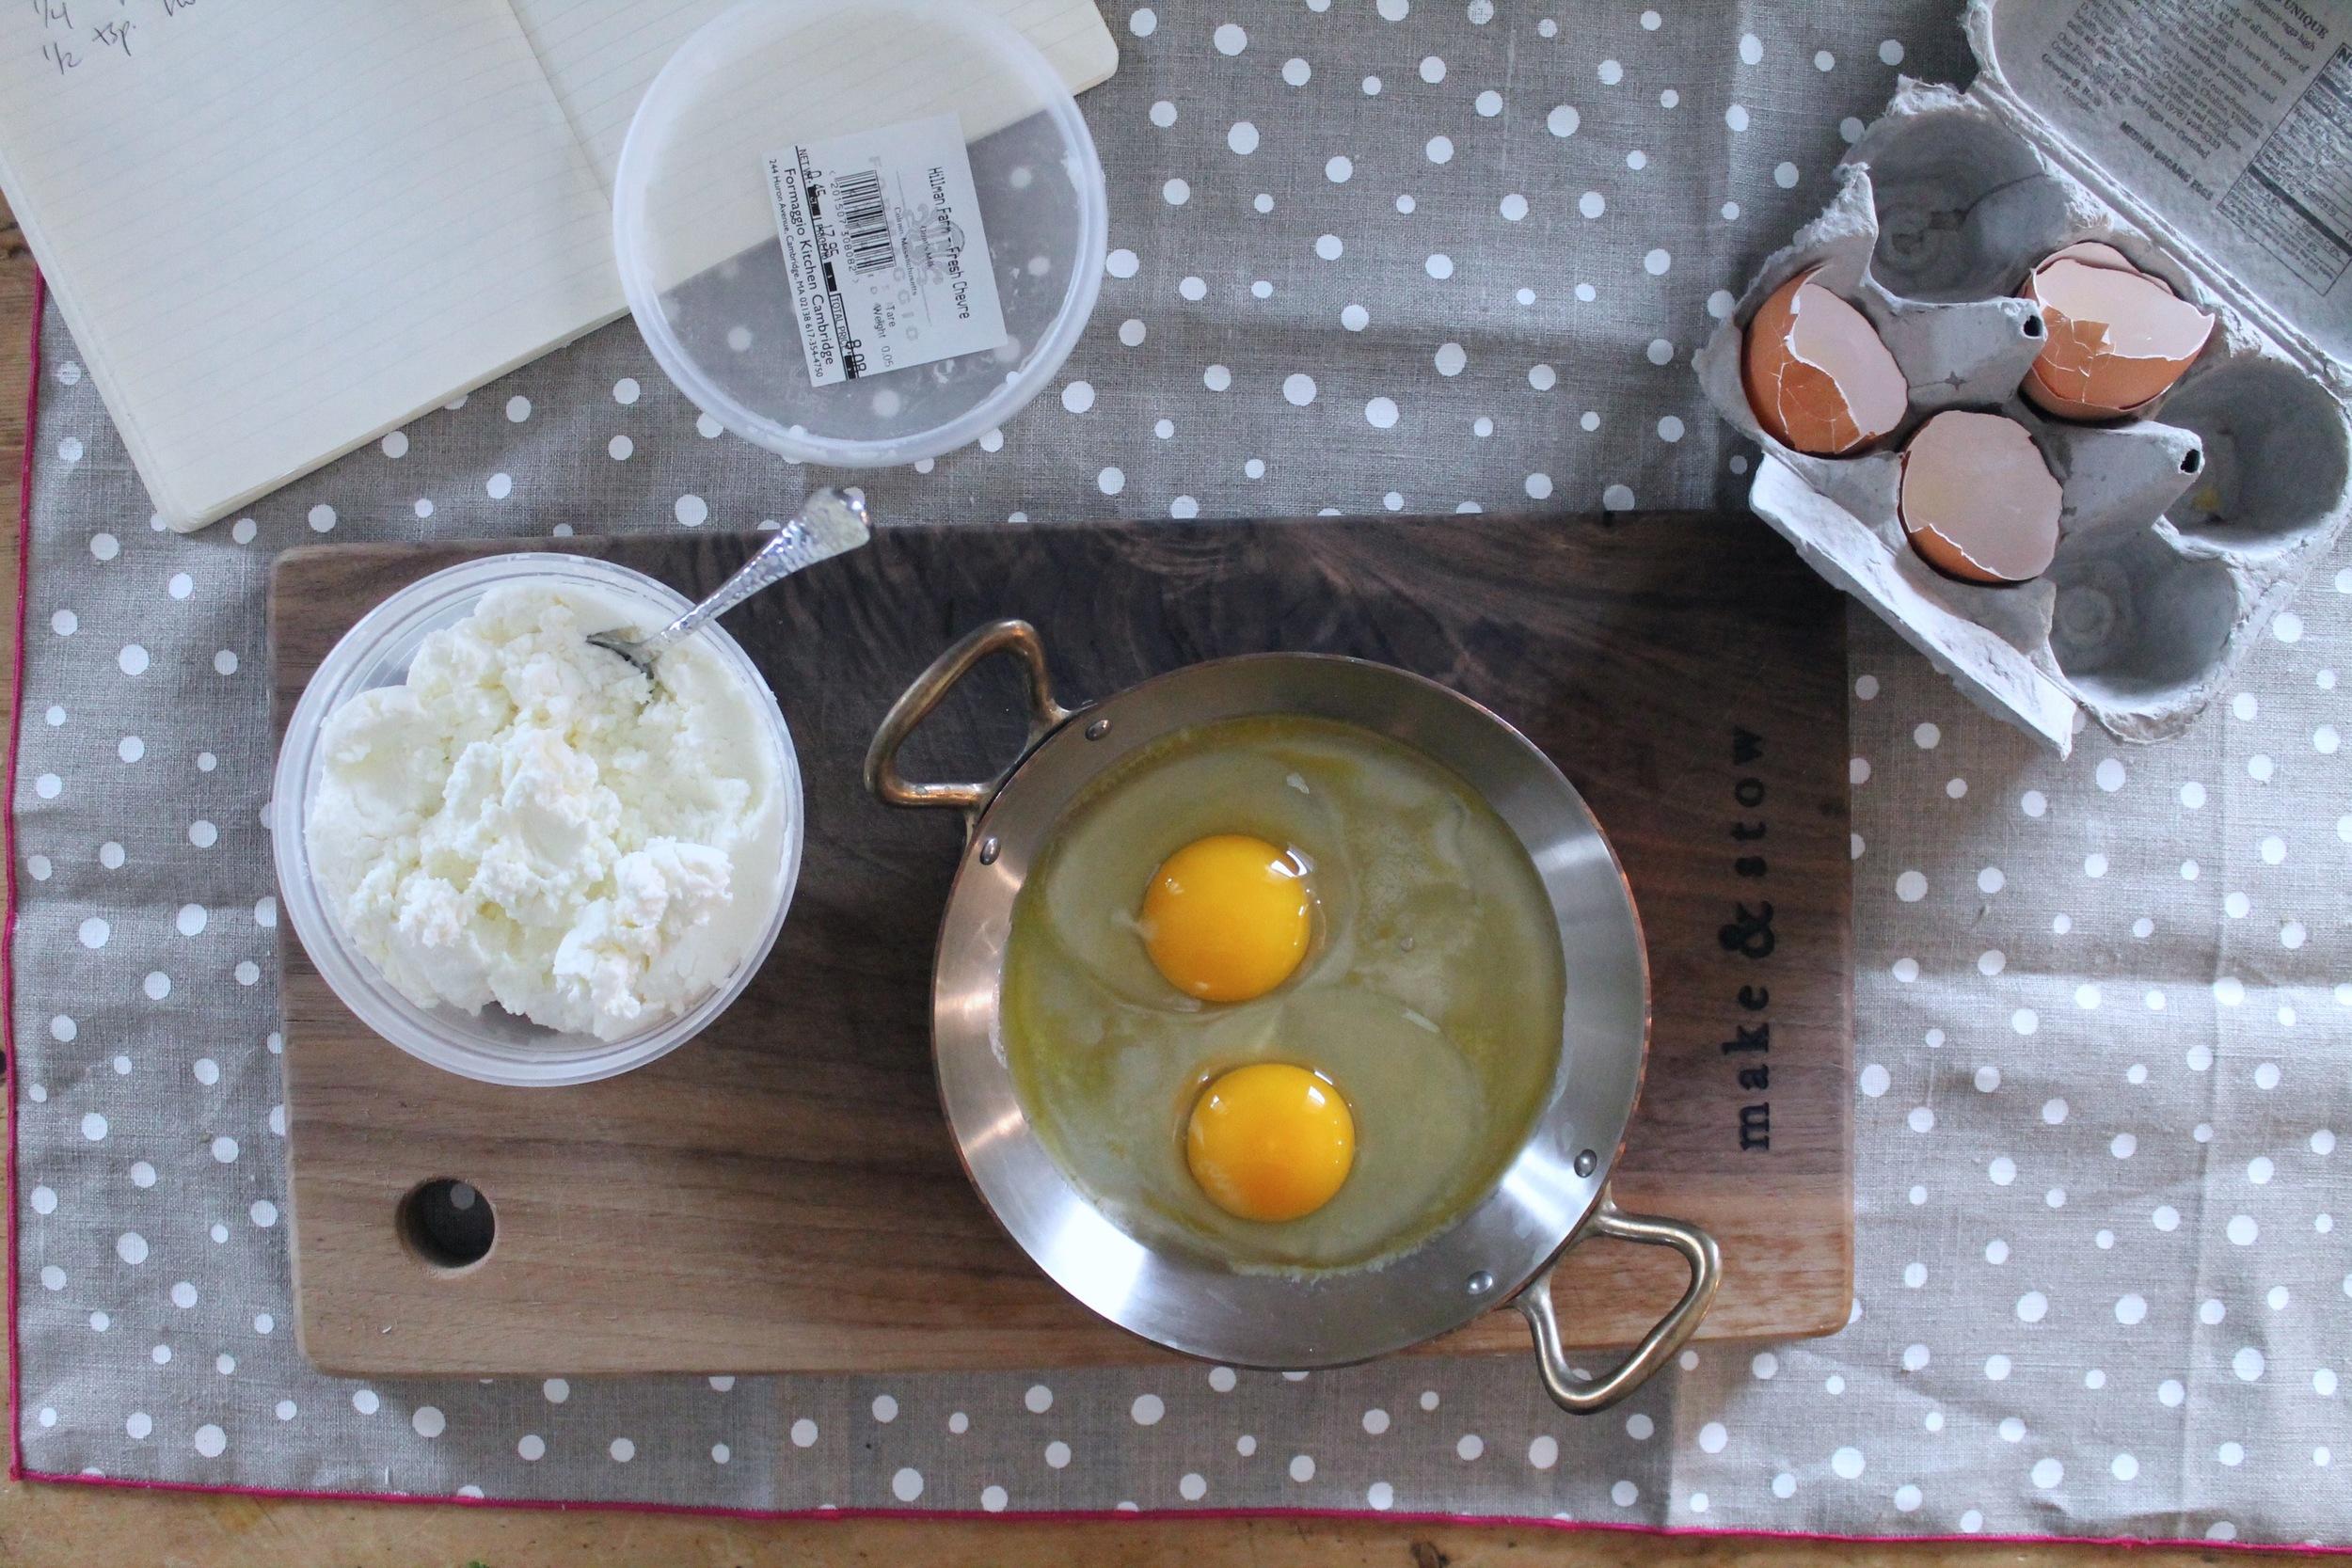 Baked Eggs with Chevre + Cilantro Chutney   www.hungryinlove.com